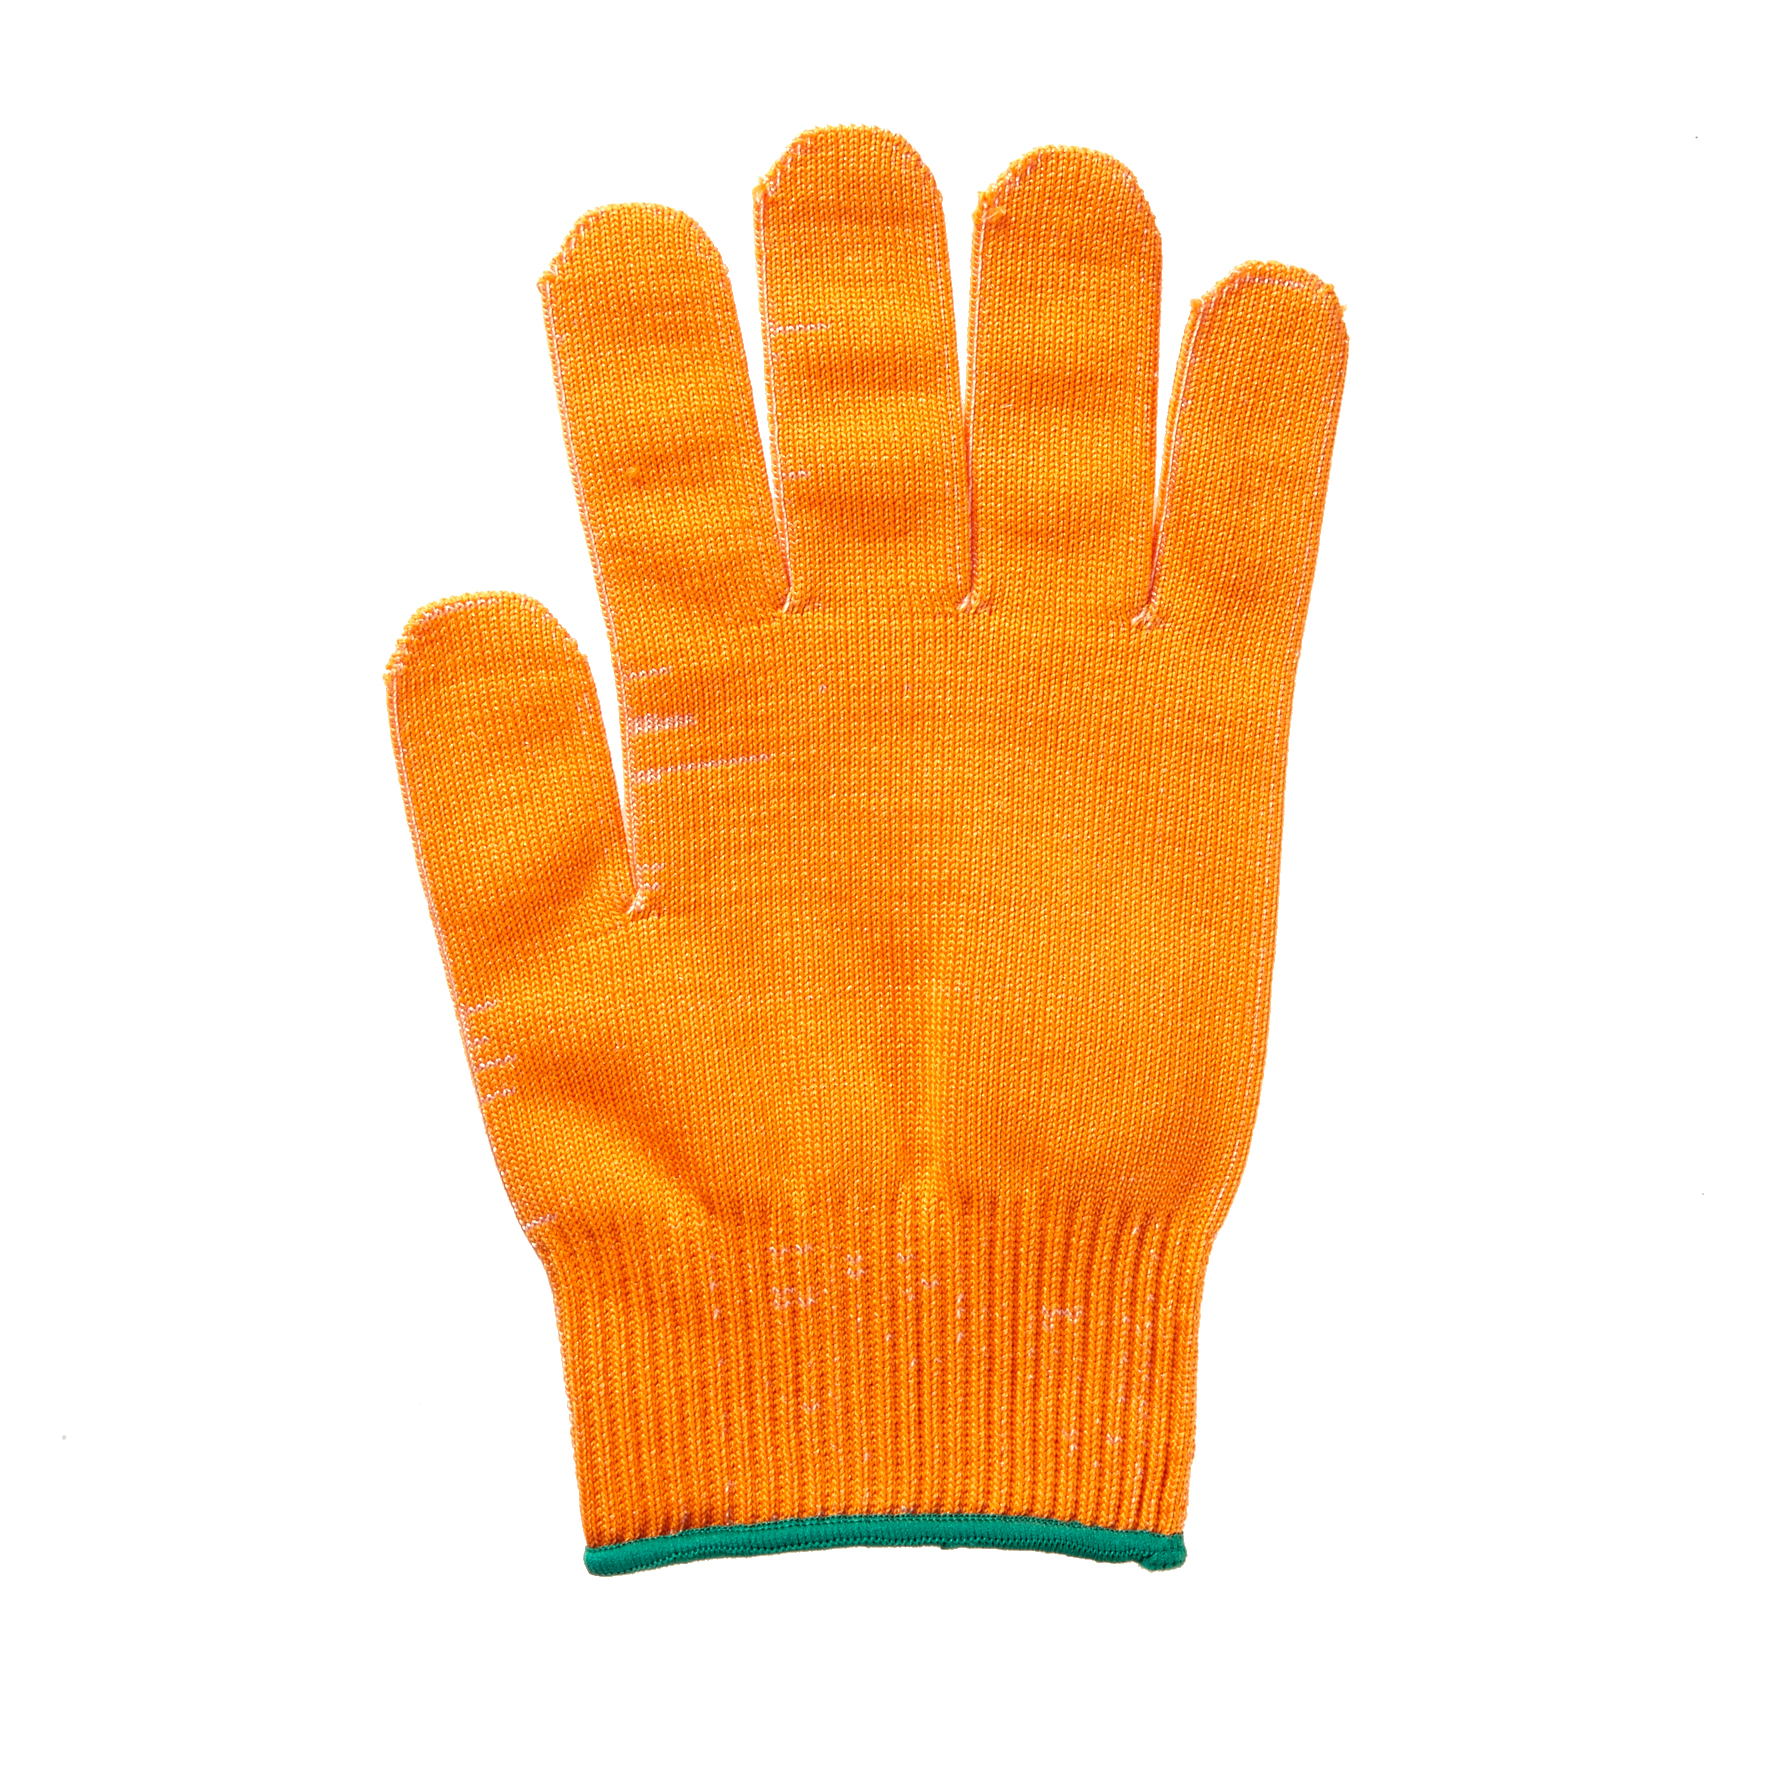 Mercer Culinary M33415ORM glove, cut resistant